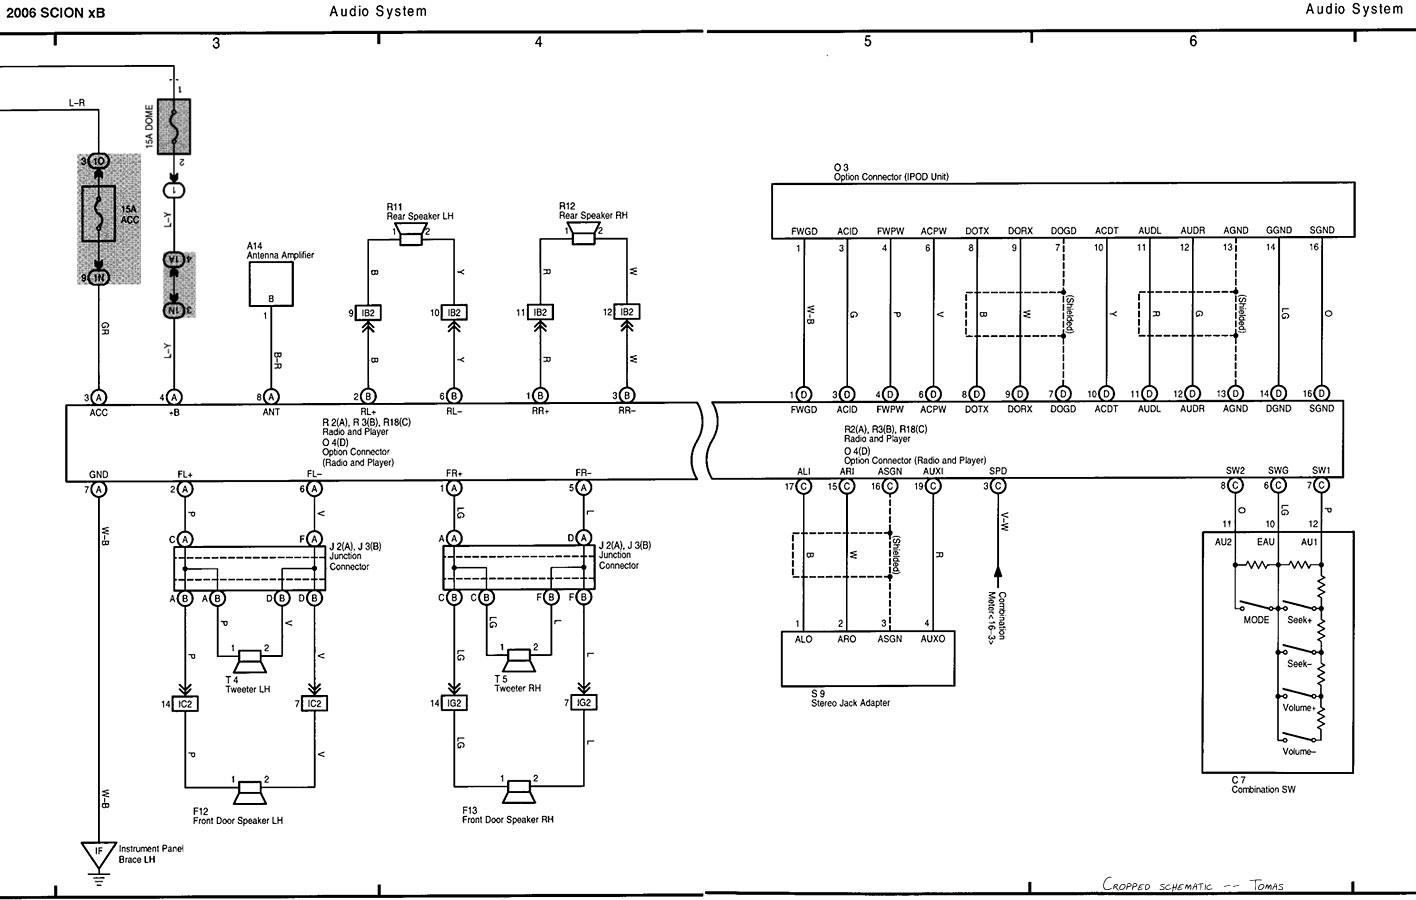 scion radio wiring diagram wiring diagrams 2011 Scion Tc Headlight Wiring Diagram 2011 scion tc wiring diagrams wiring